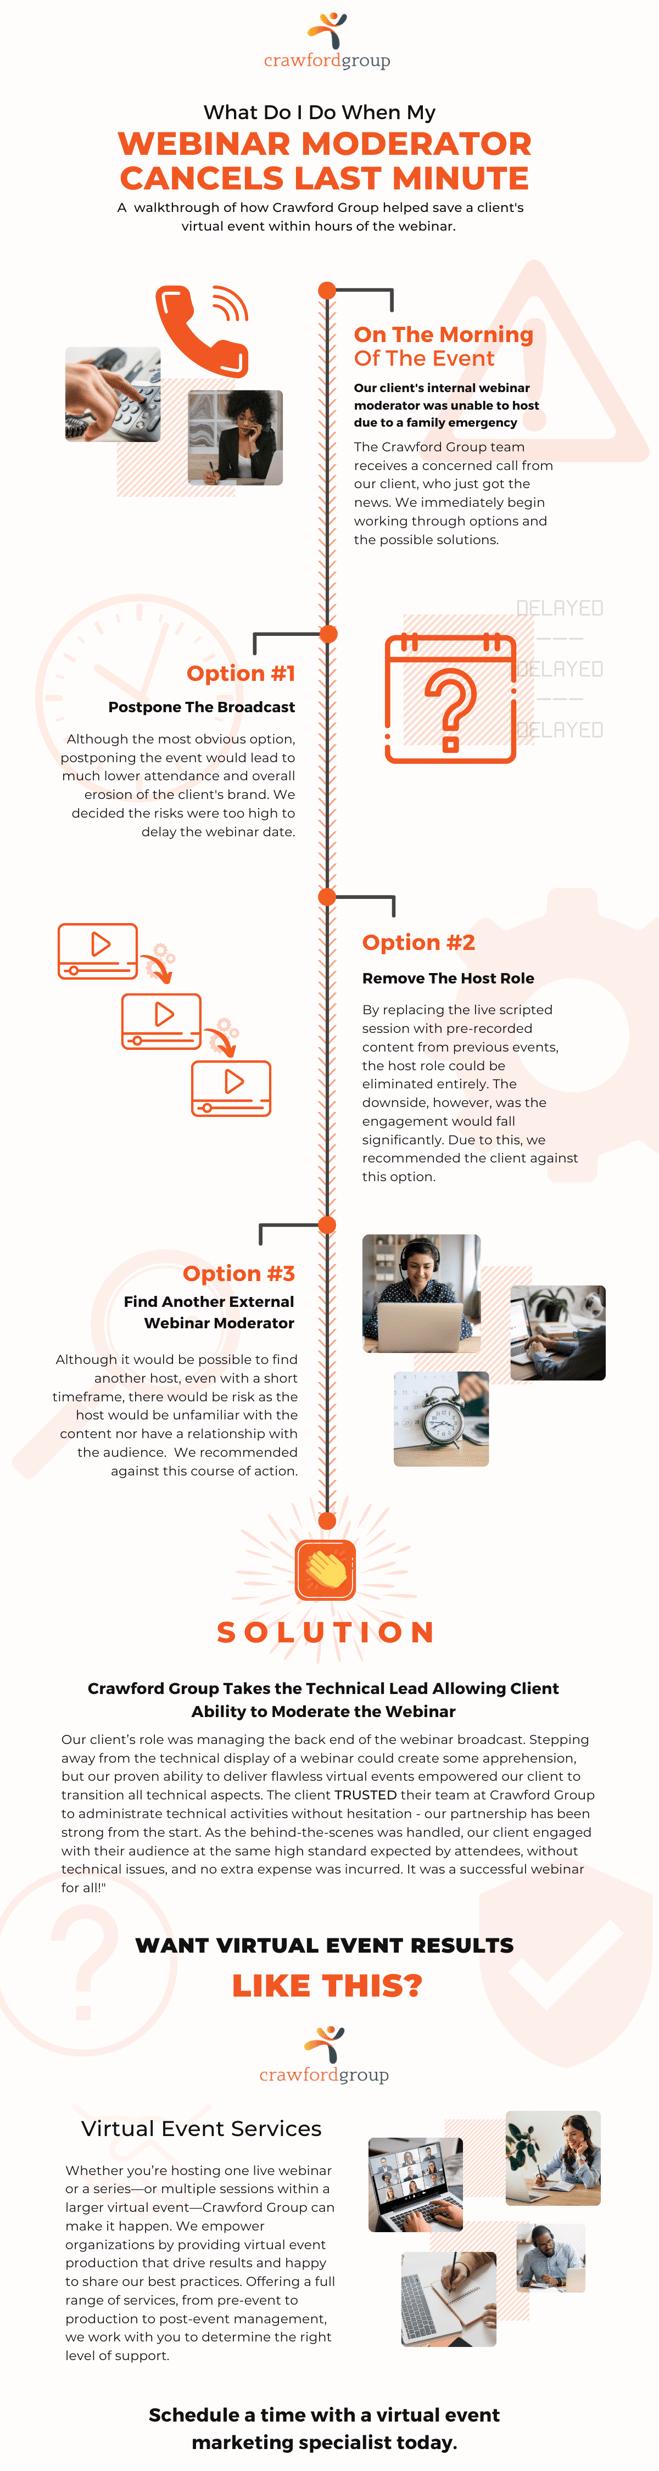 [Crawford Group] Webinar Case Study Infographic Draft 1 (1)